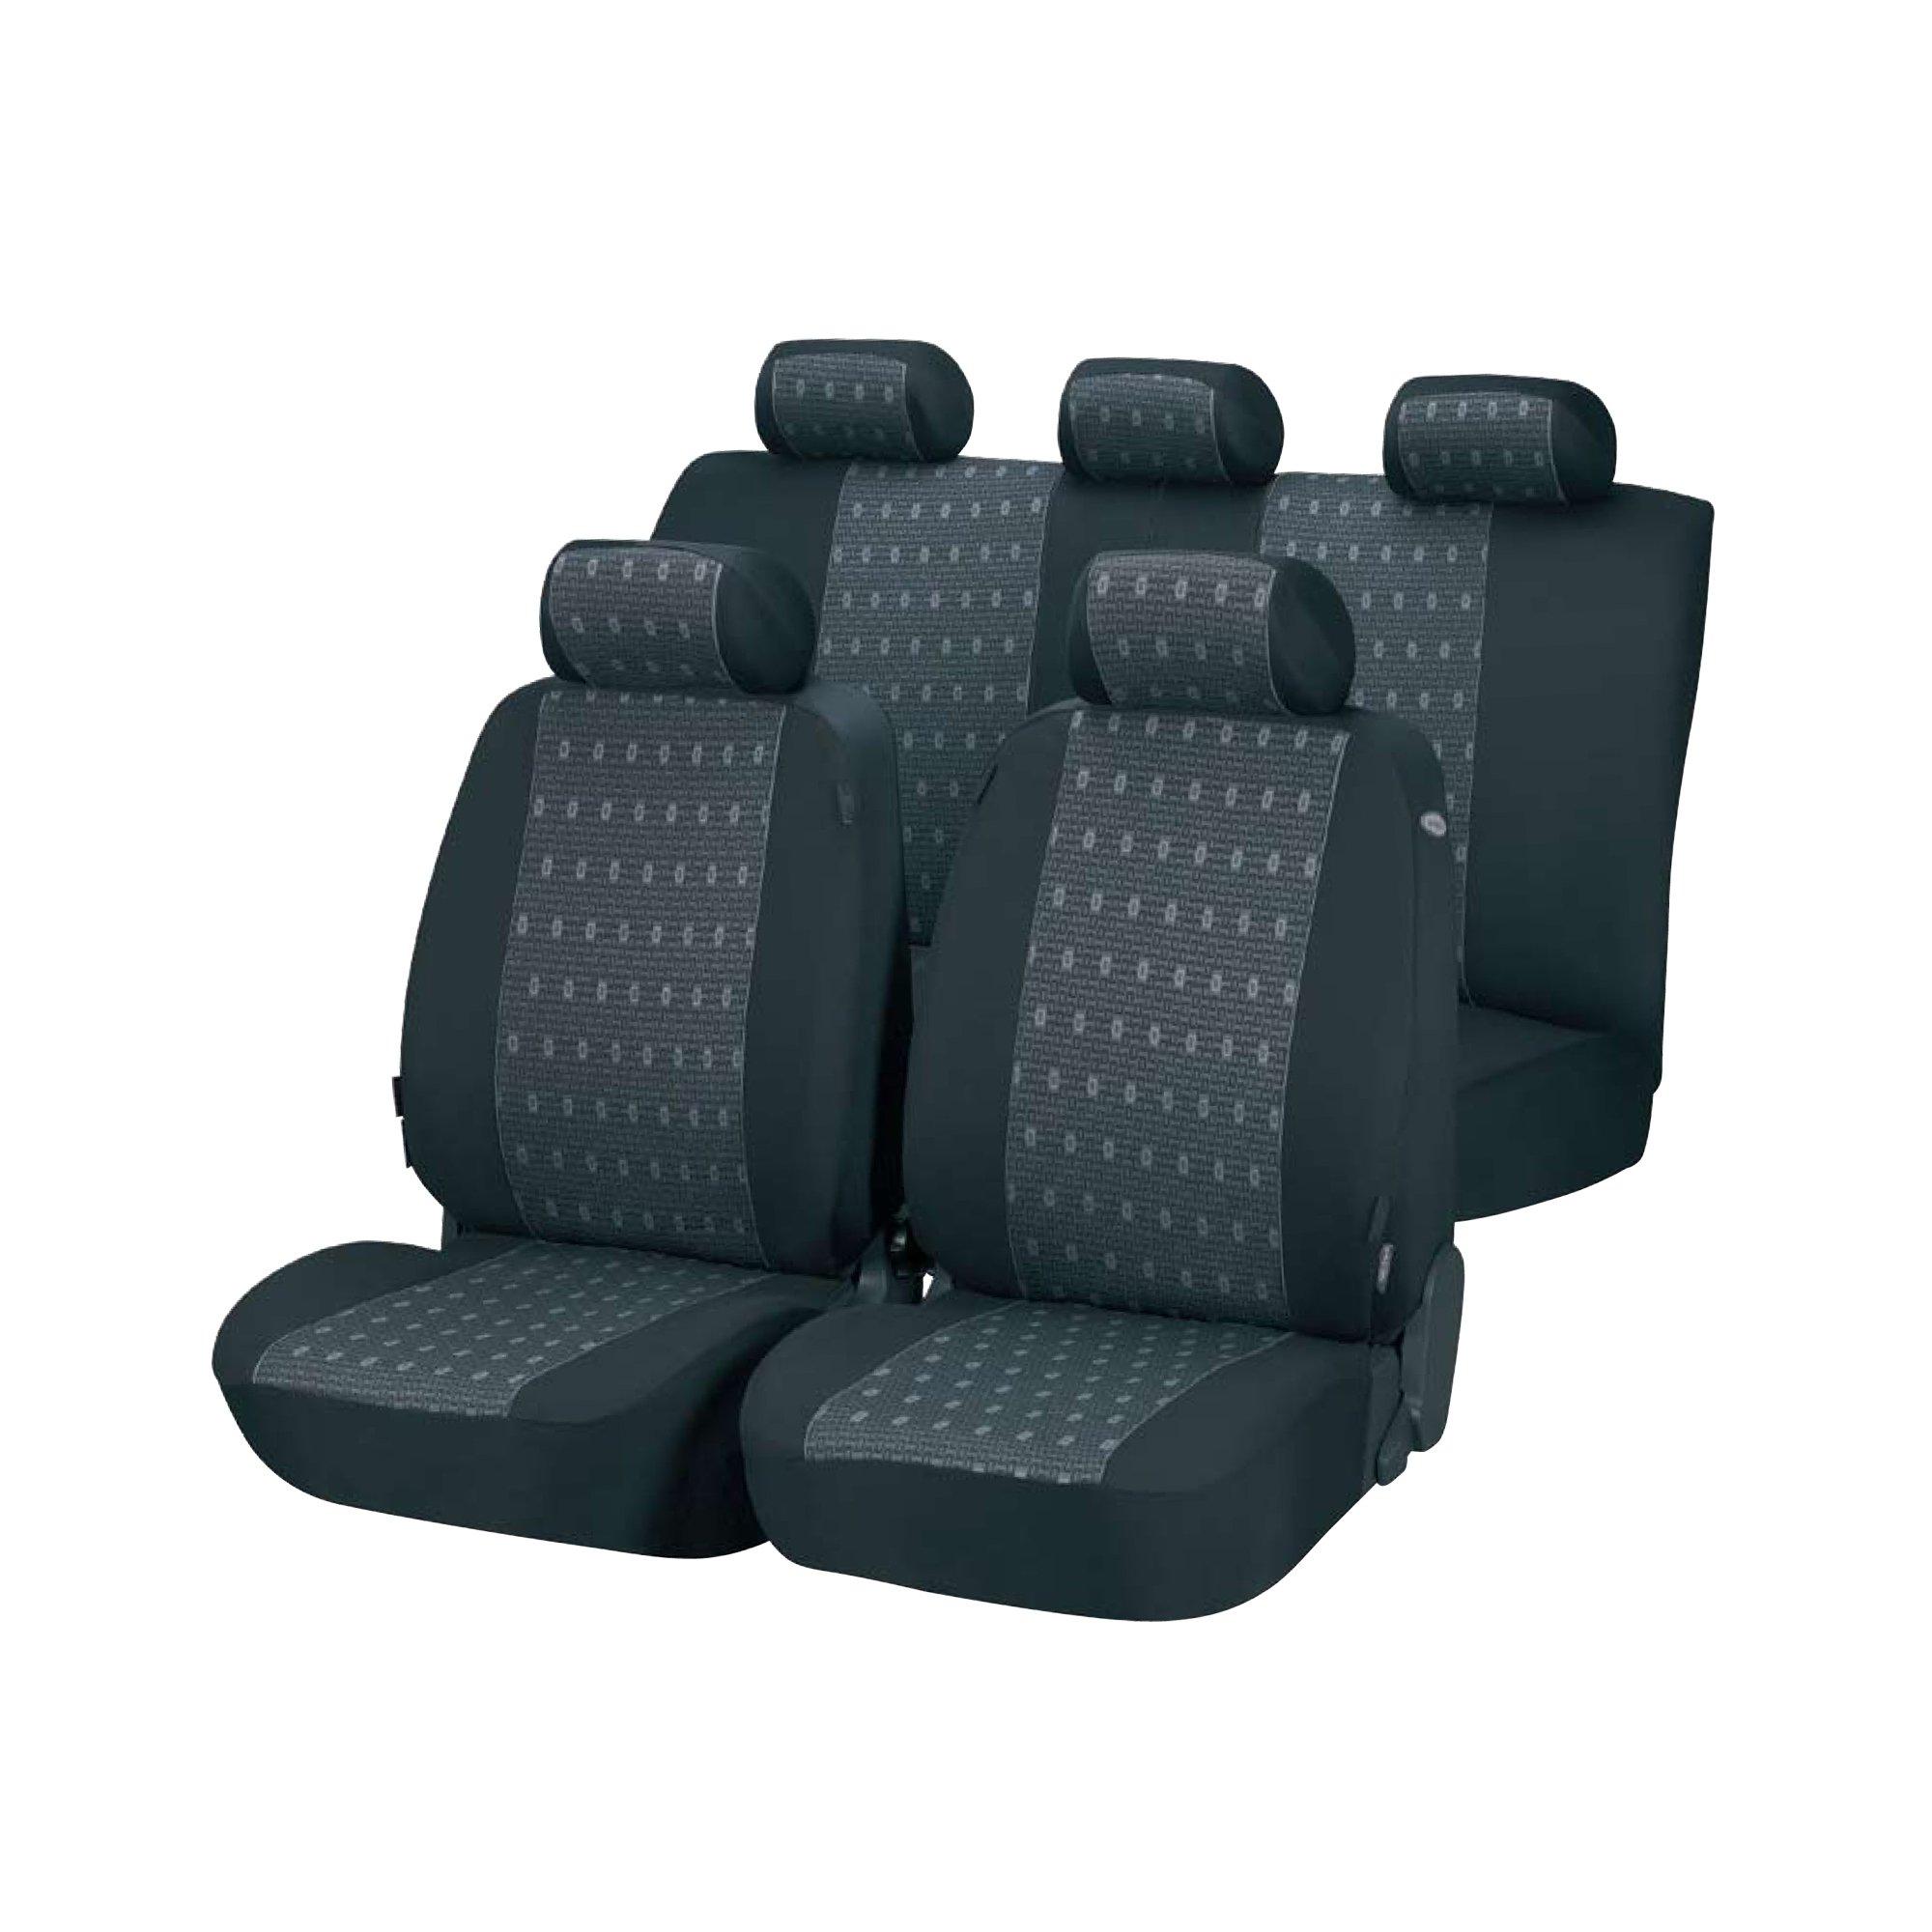 Fine Details About Masque Innsbrook Seat Covers Grey 4 Piece 67224Es Creativecarmelina Interior Chair Design Creativecarmelinacom